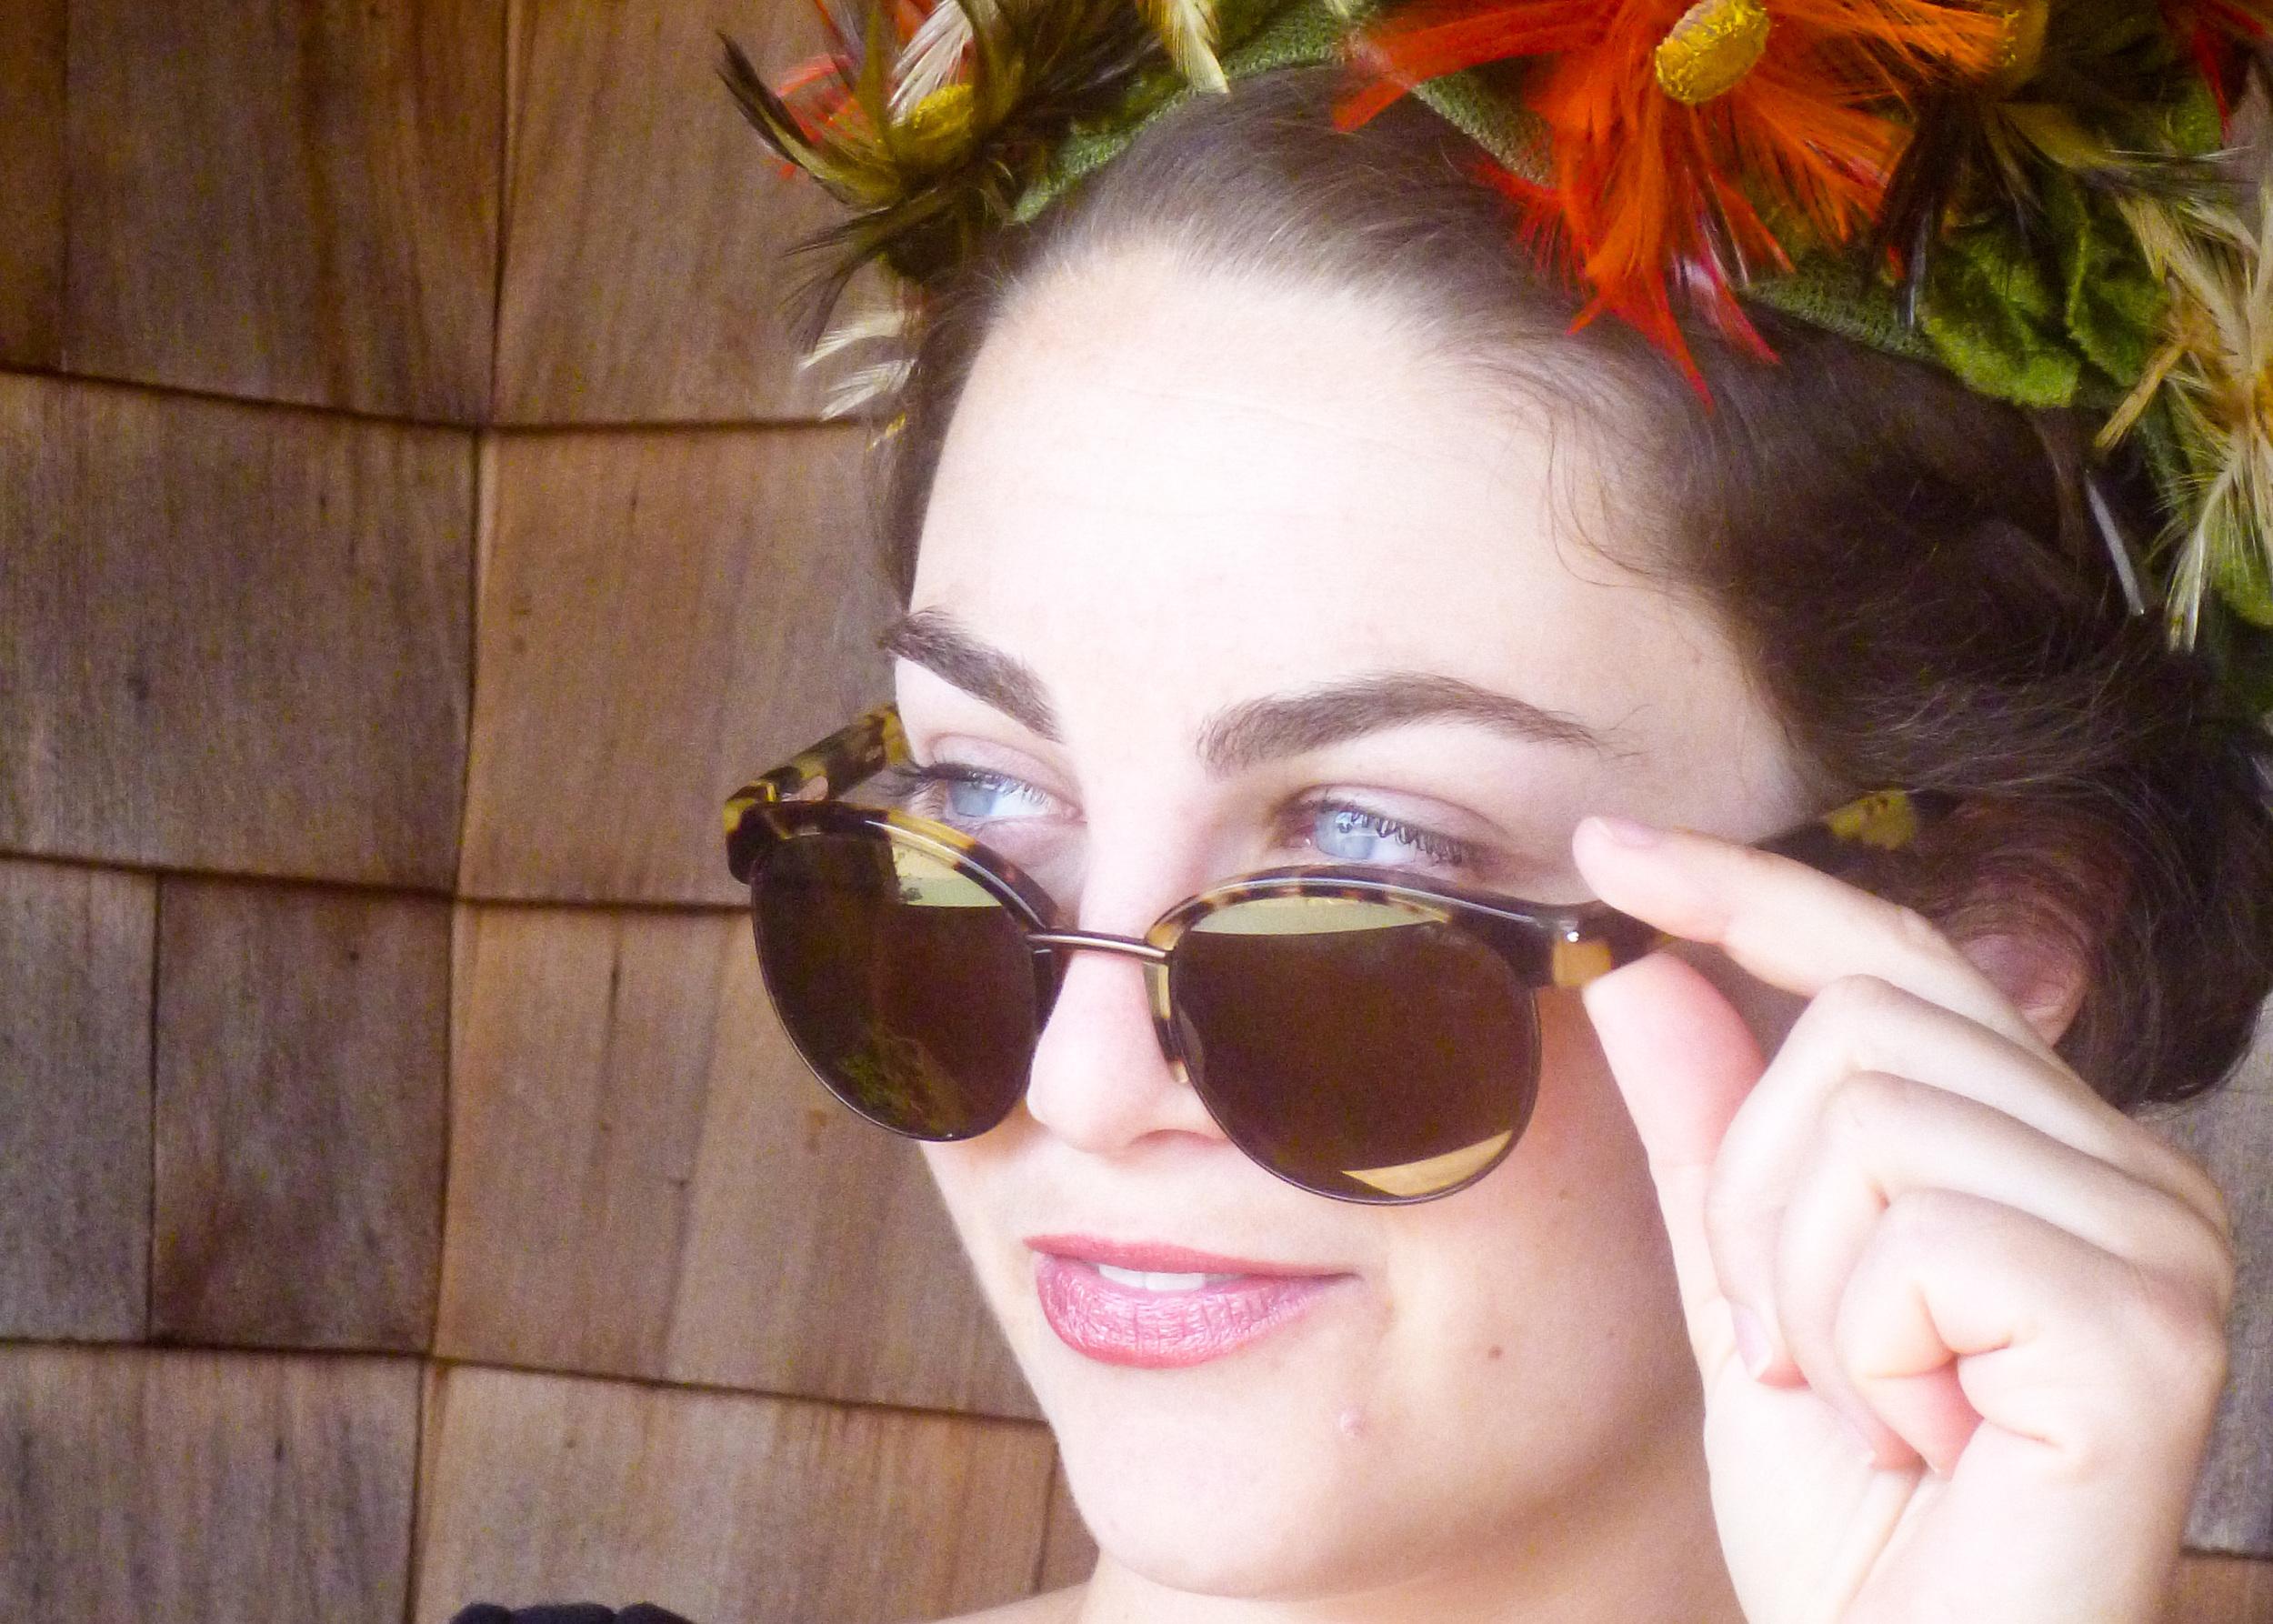 alue-optics-one-sunglasses-tawny-tort-kira.jpg